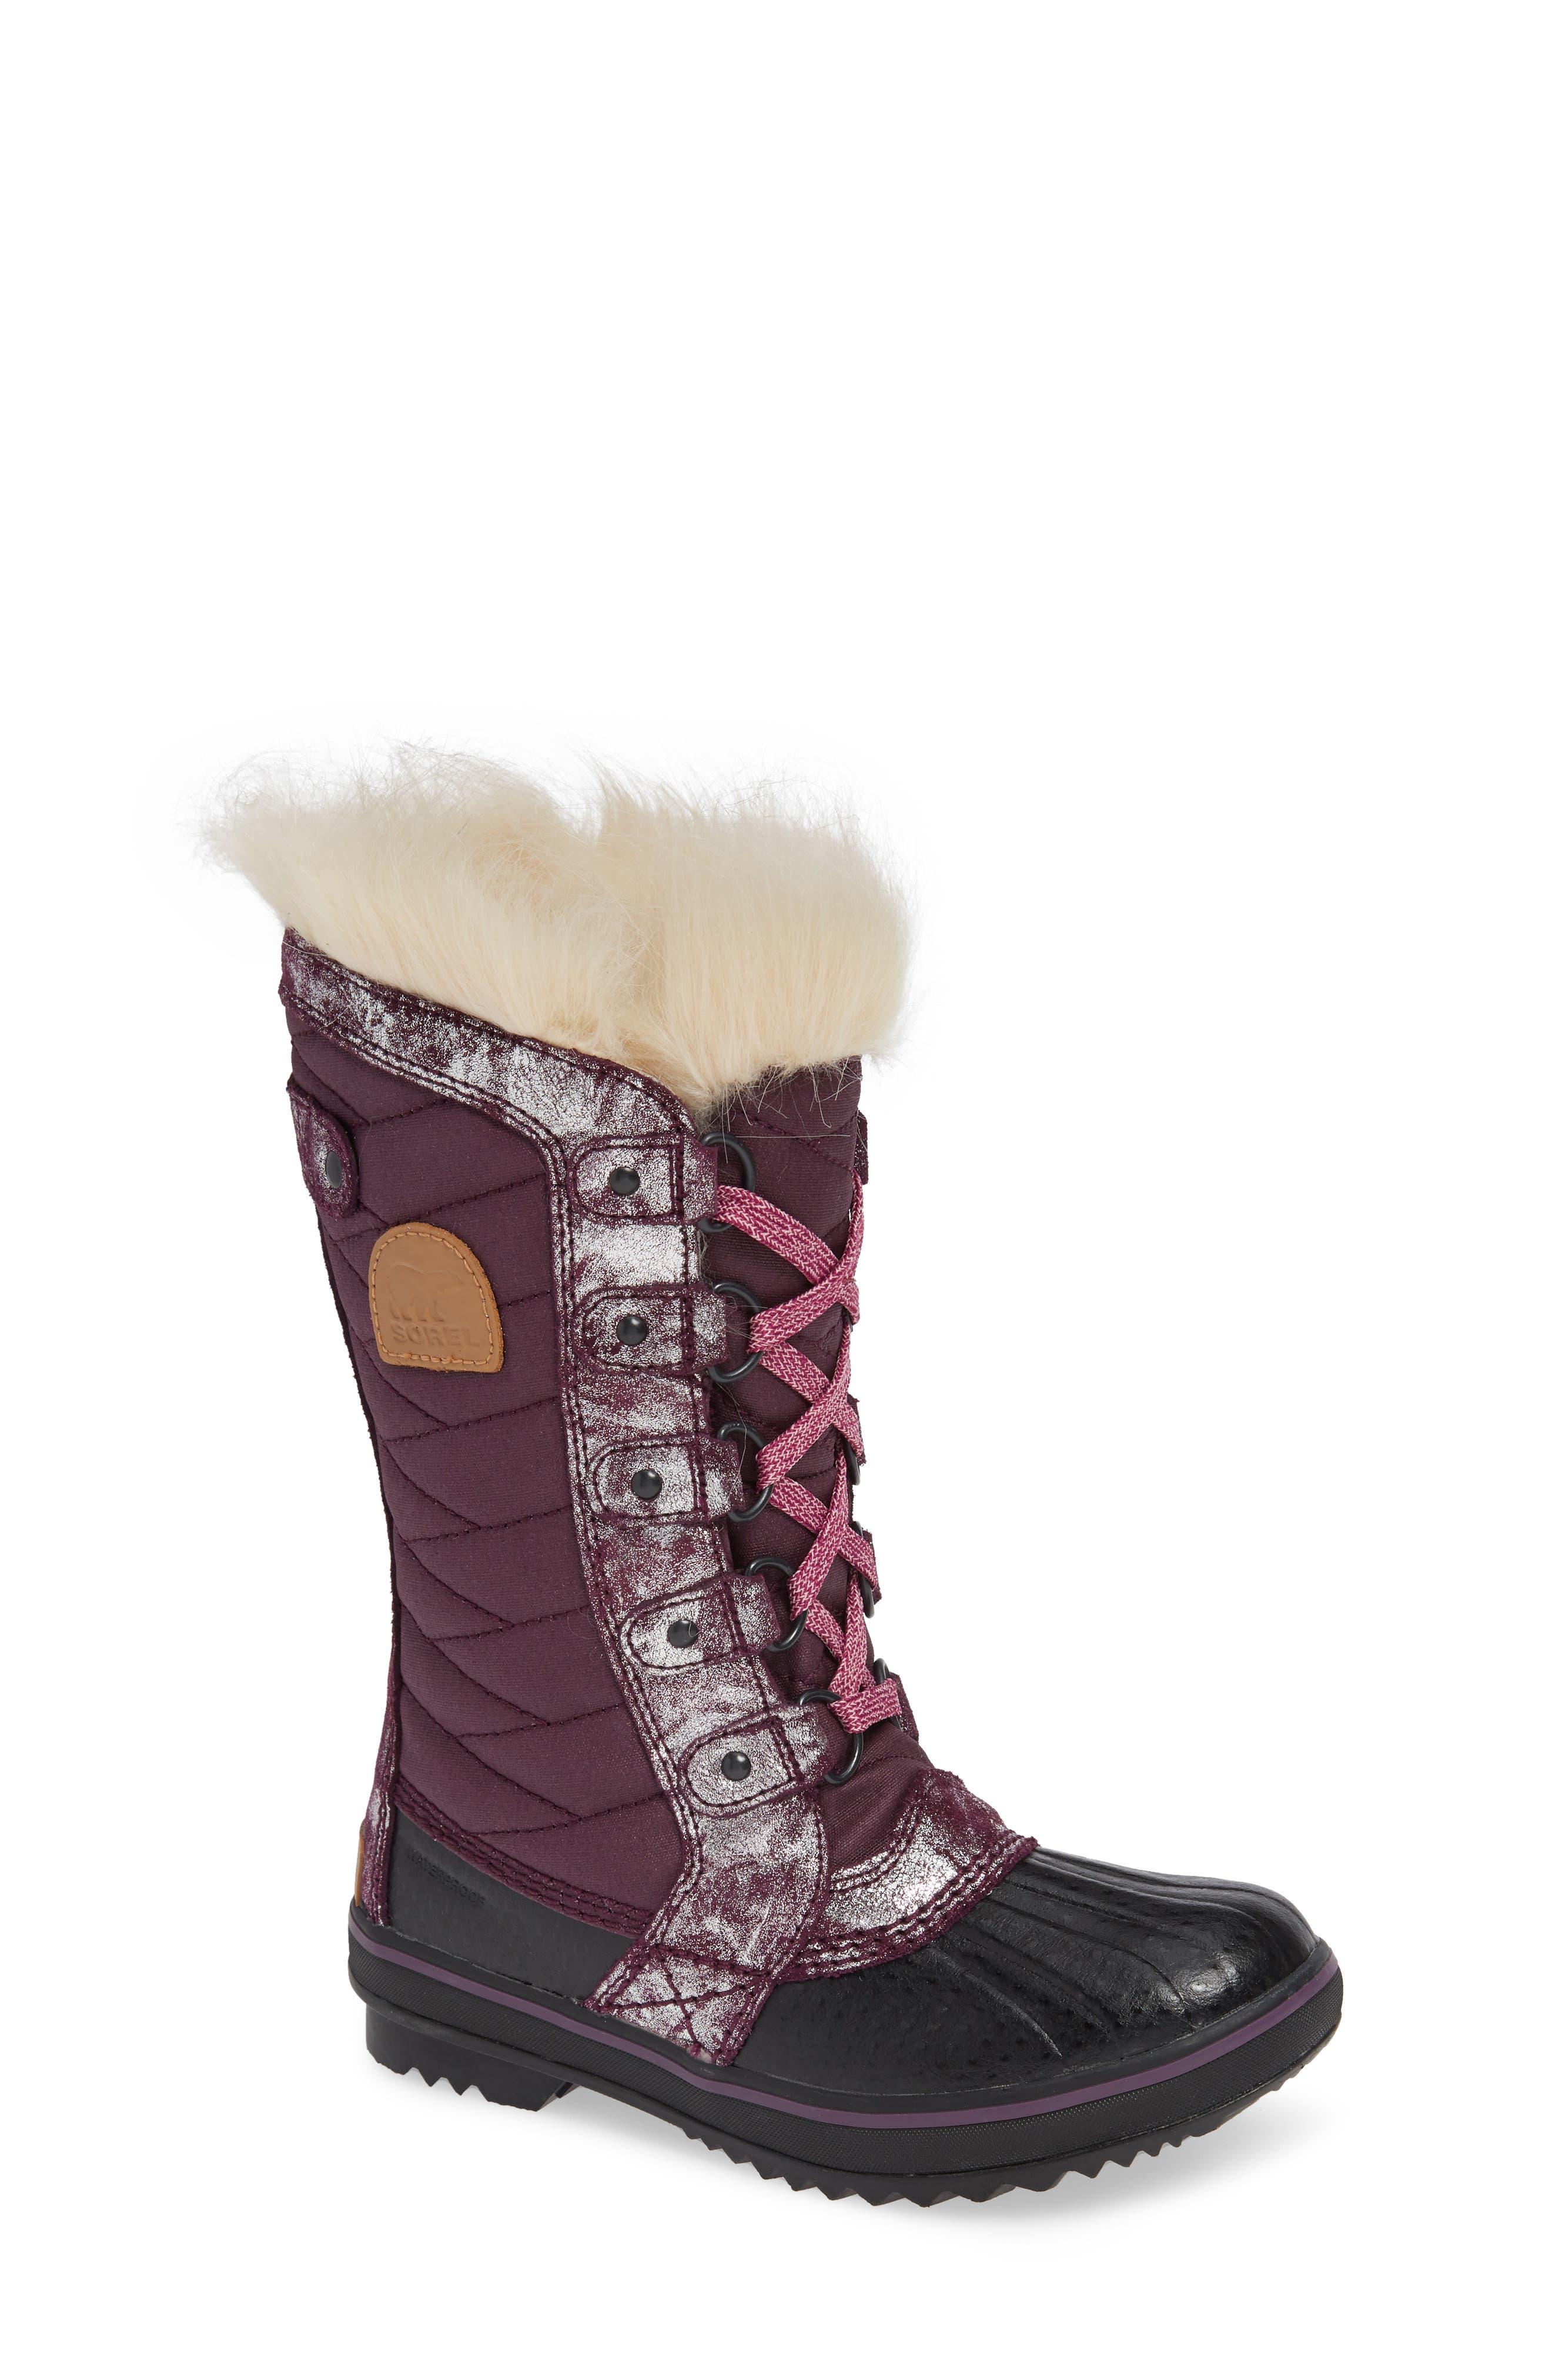 Tofino II Faux Fur Lined Waterproof Boot,                             Main thumbnail 1, color,                             562